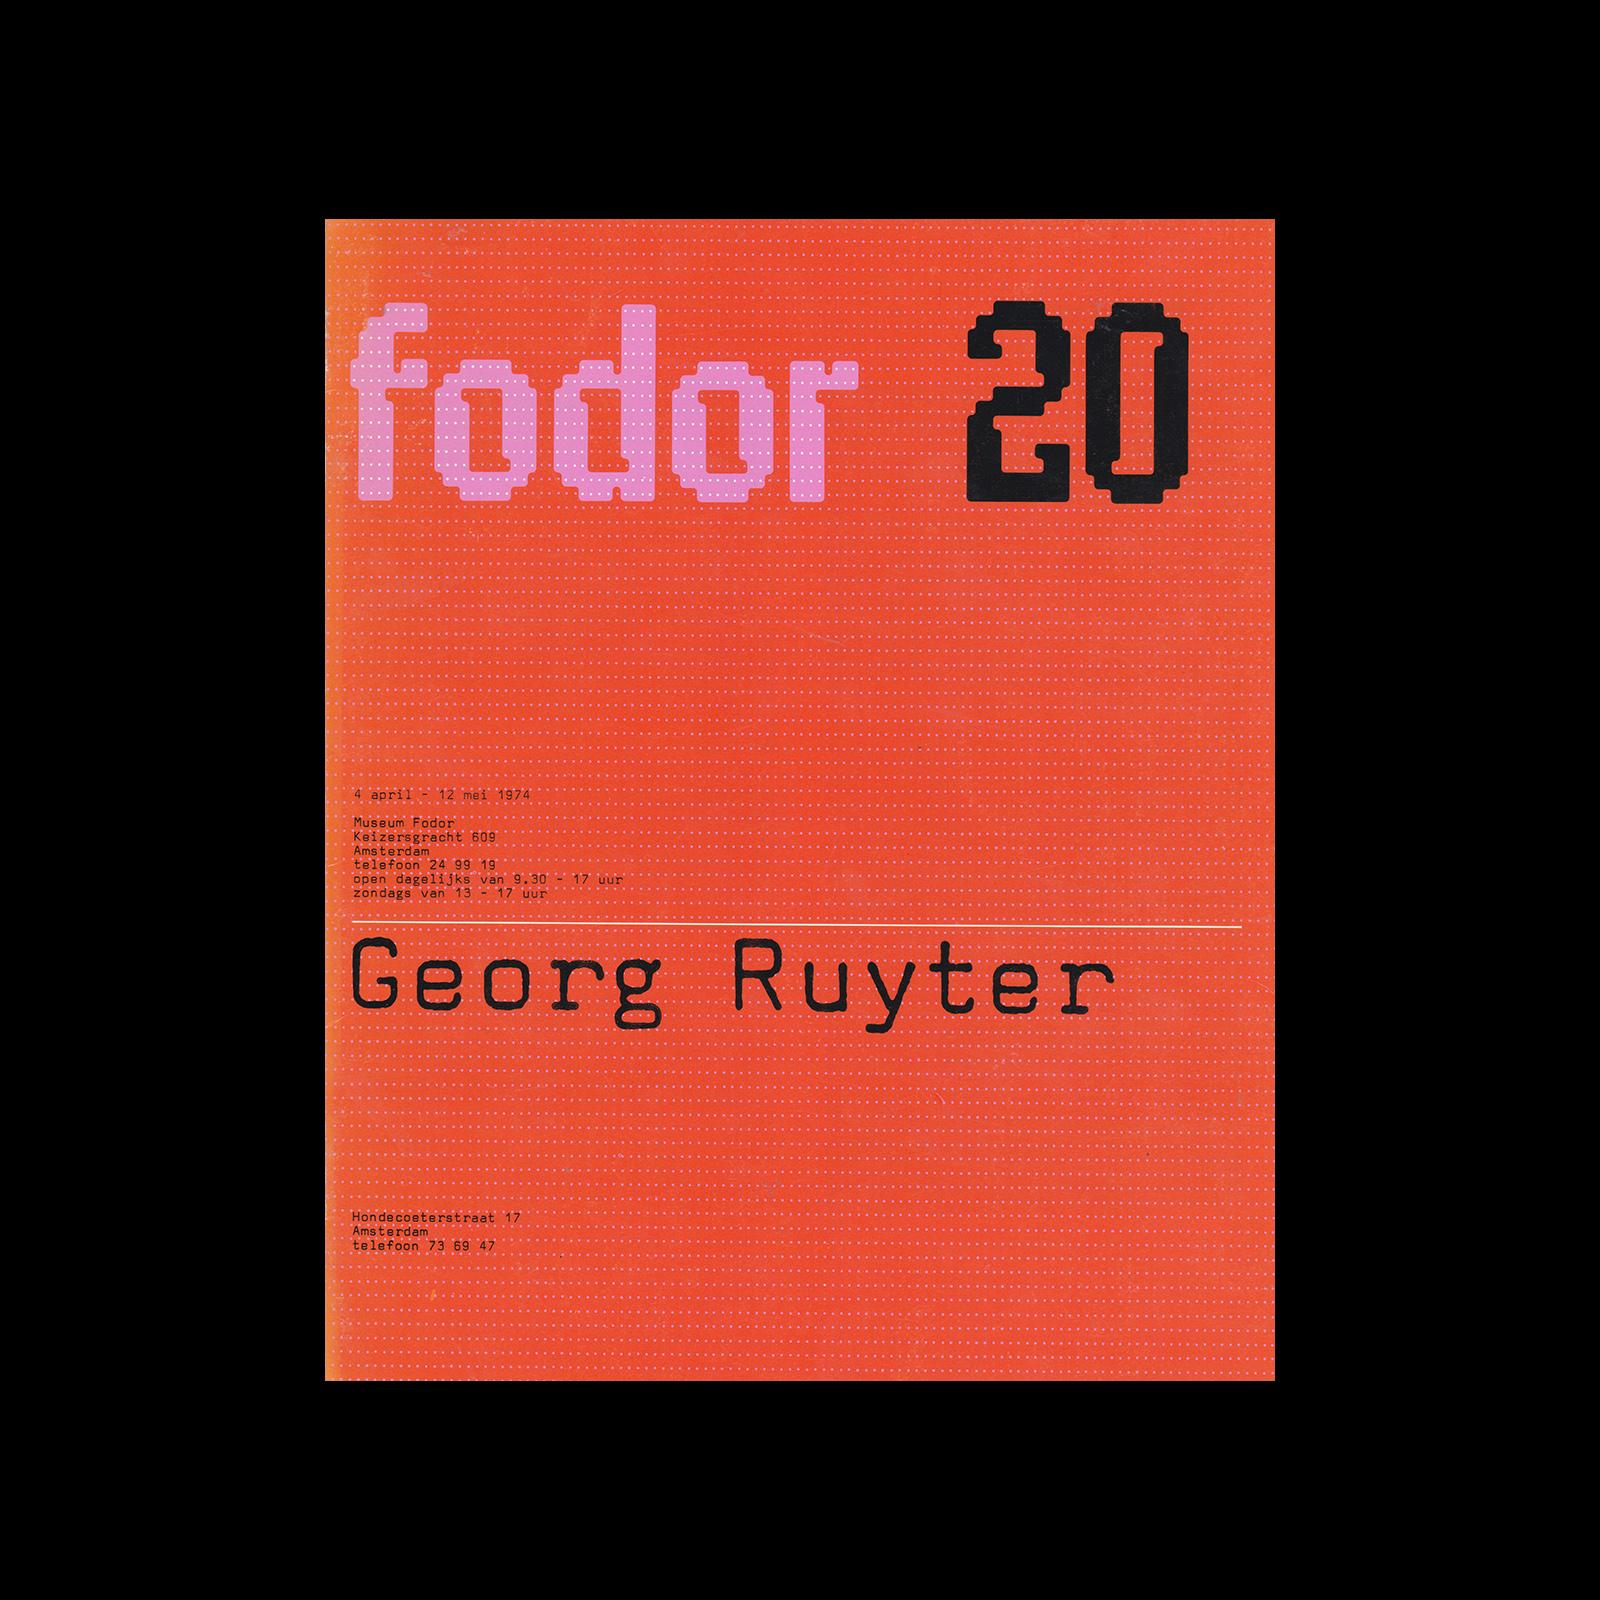 Fodor 20, 1974 - Georg Ruyter. Designed by Wim Crouwel and Daphne Duijvelshoff (Total Design)